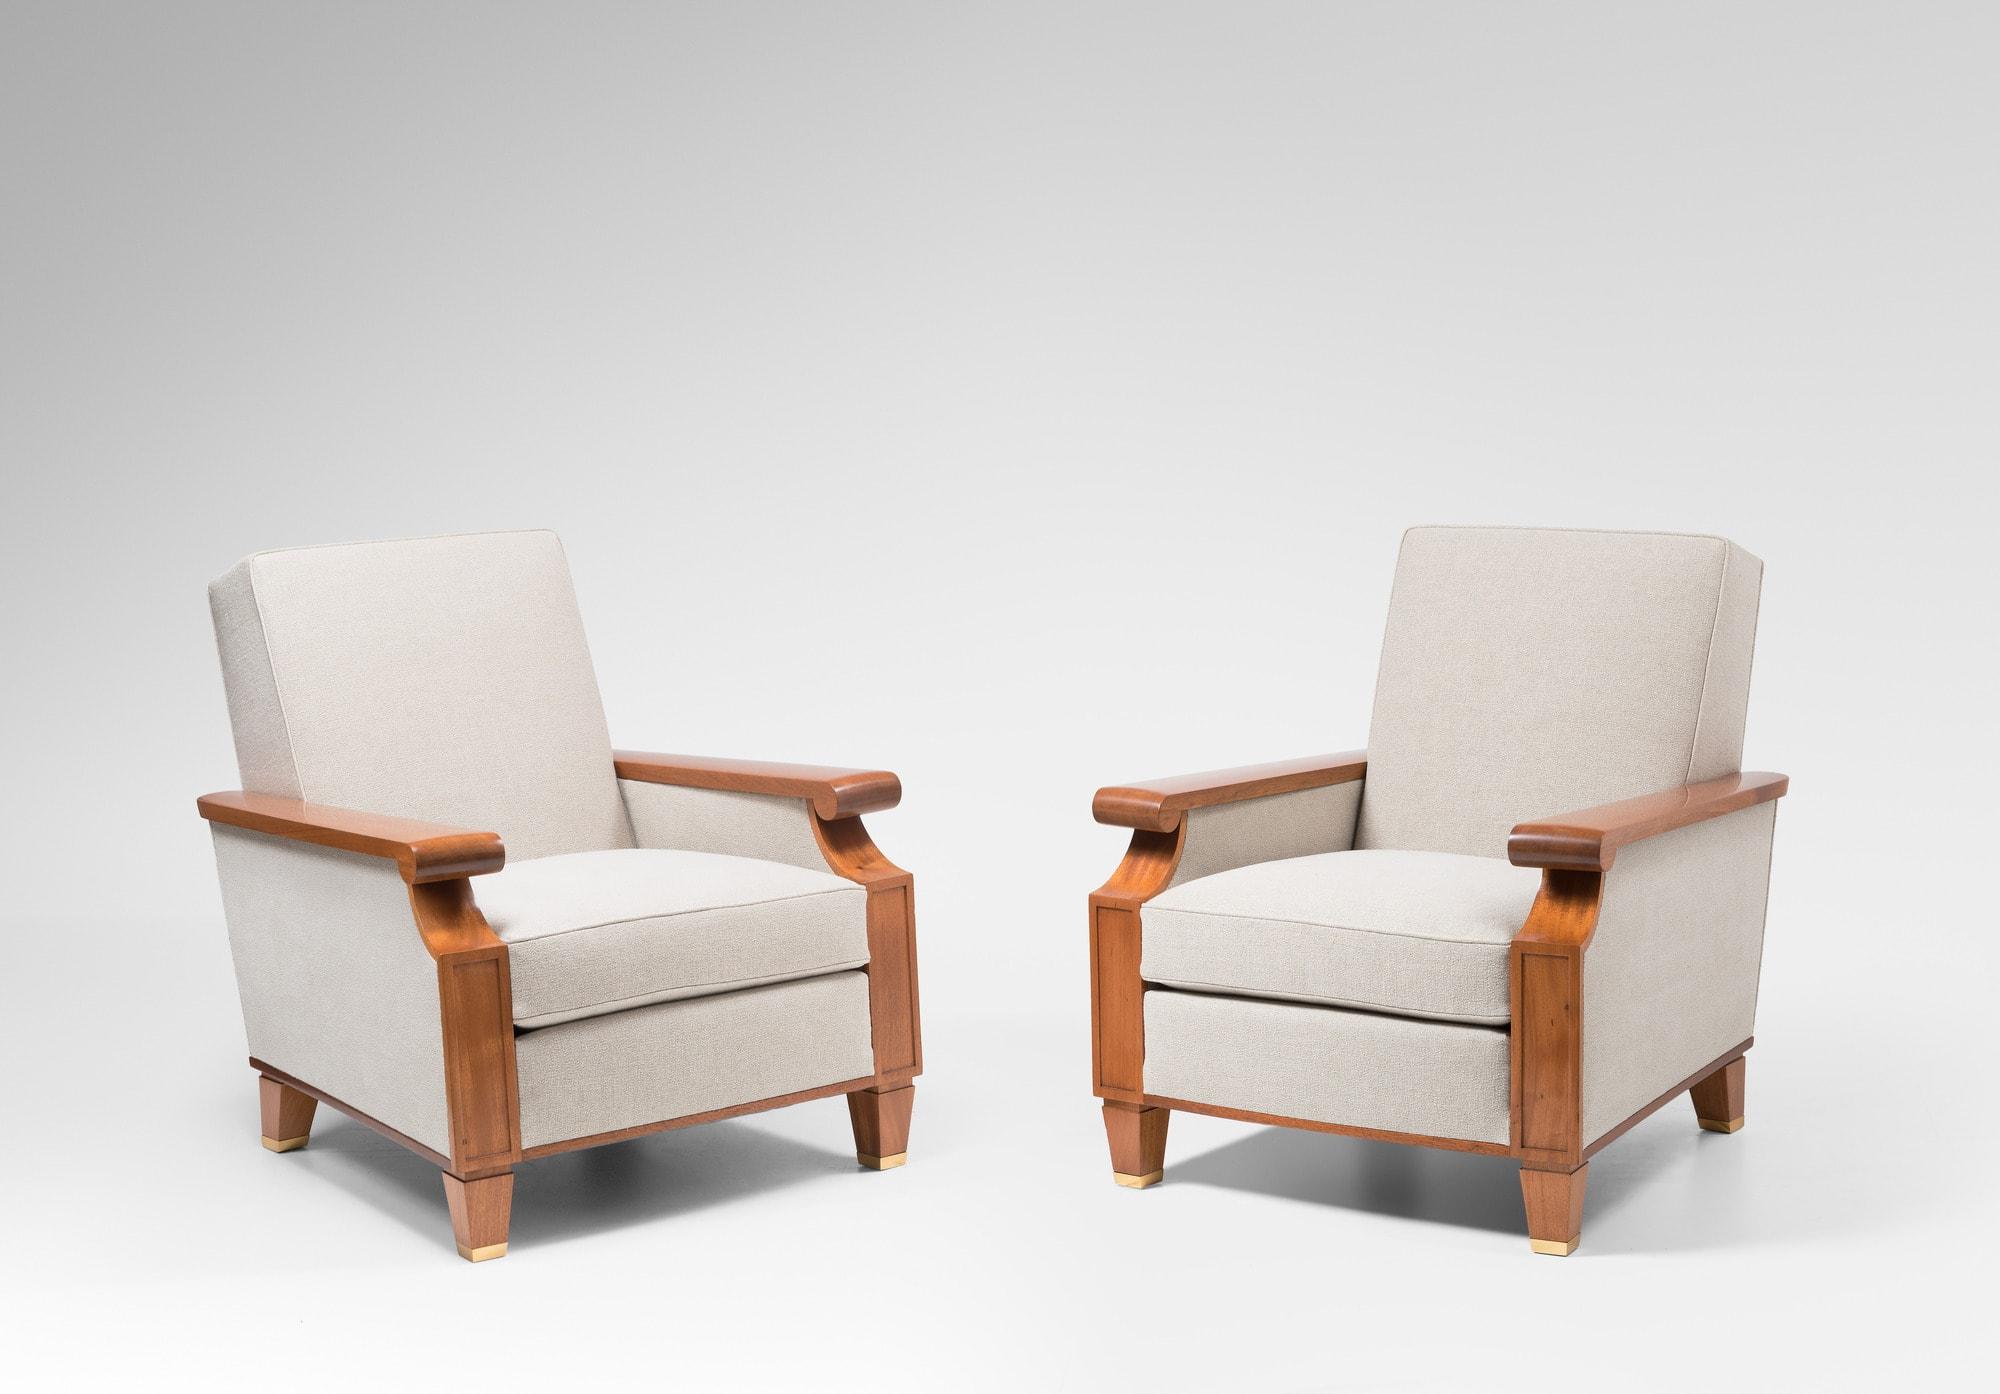 Important et rare pair of armchairs for the Palais des Consuls in Rouen, vue 02